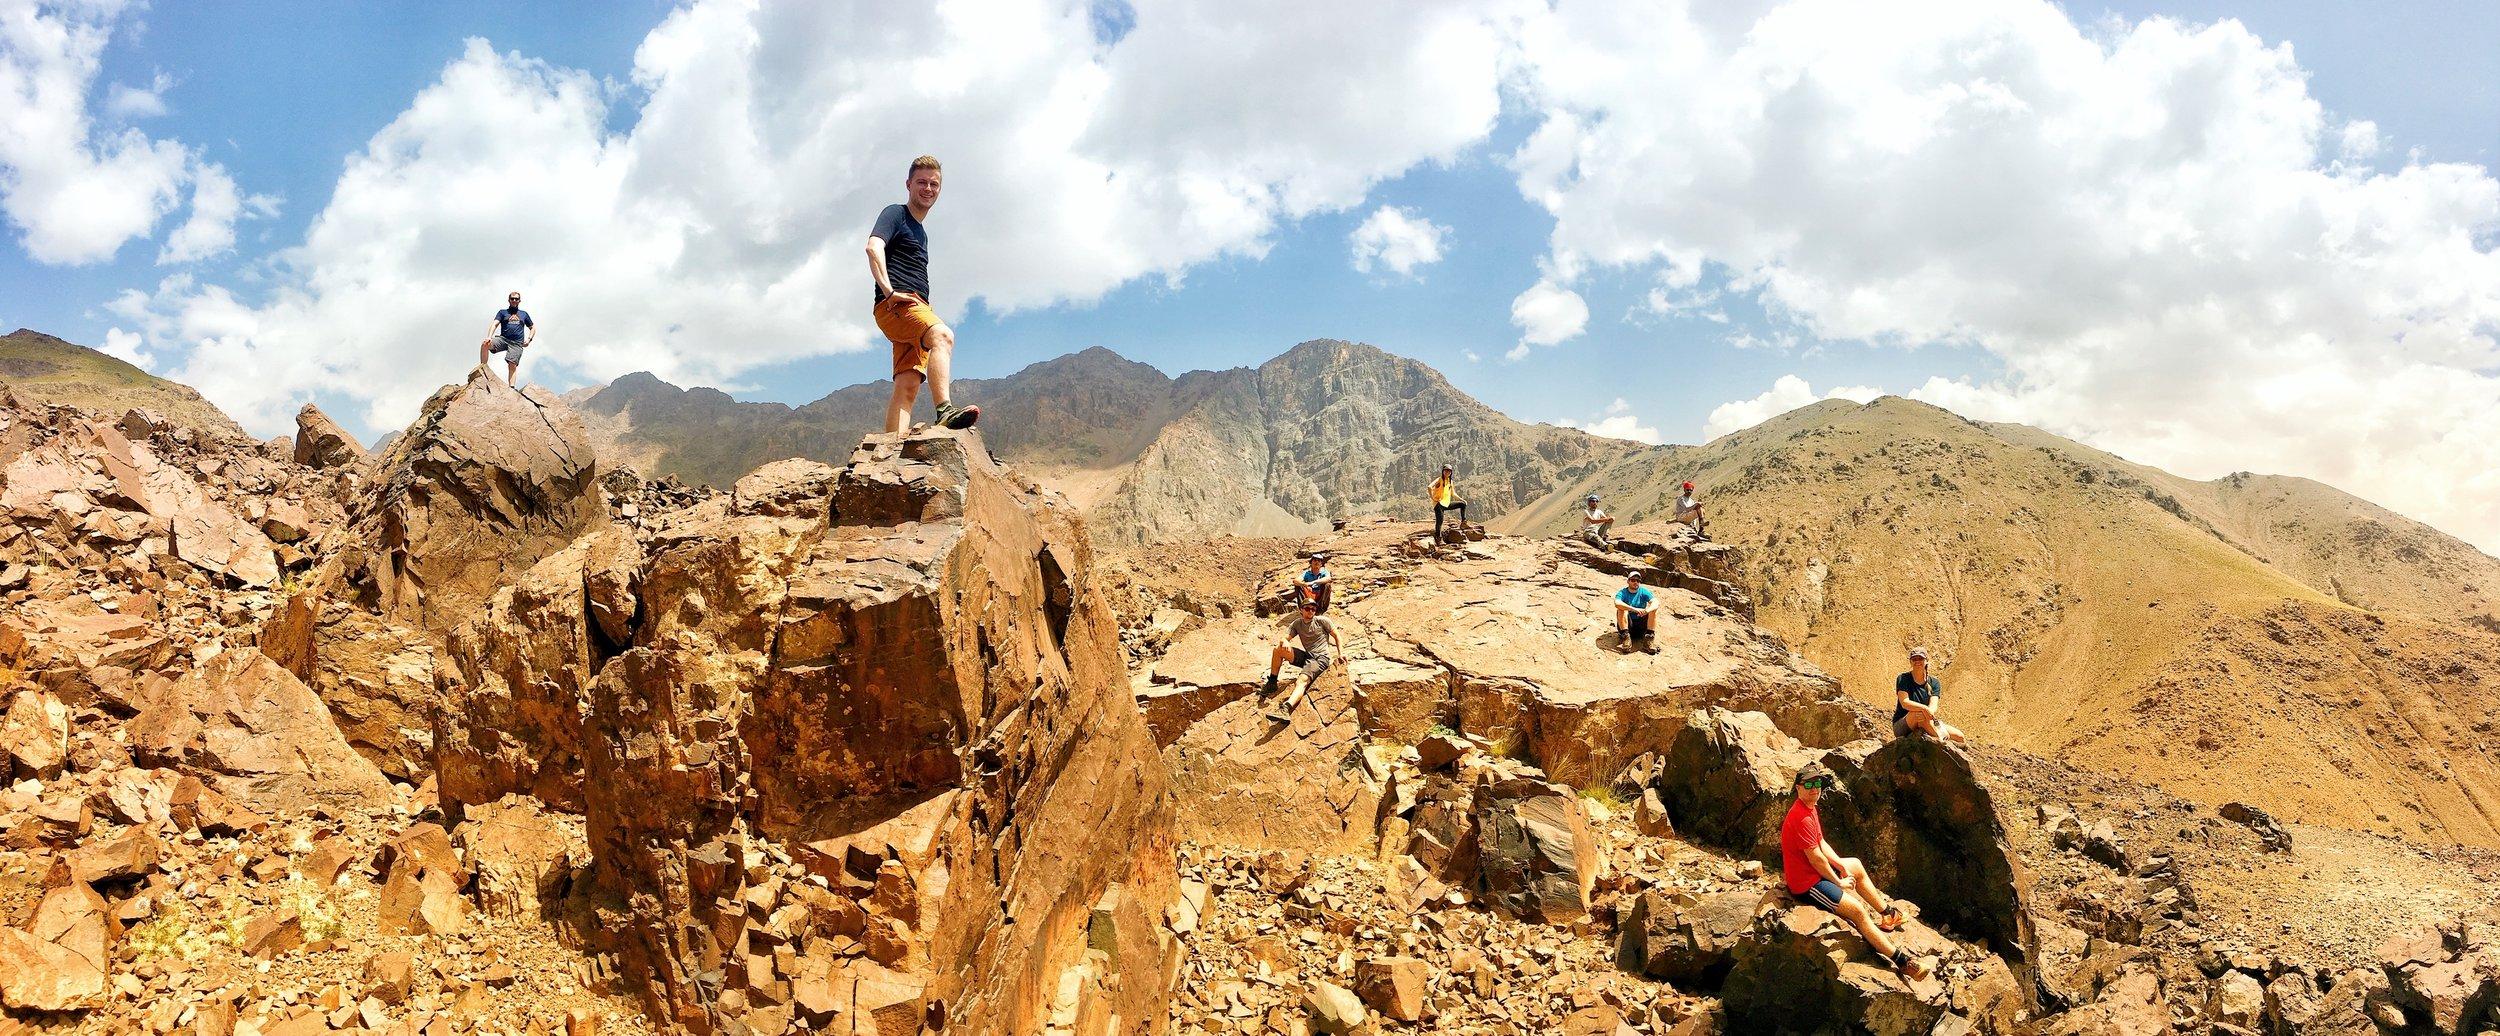 Atlas Mountains North Africa.JPG